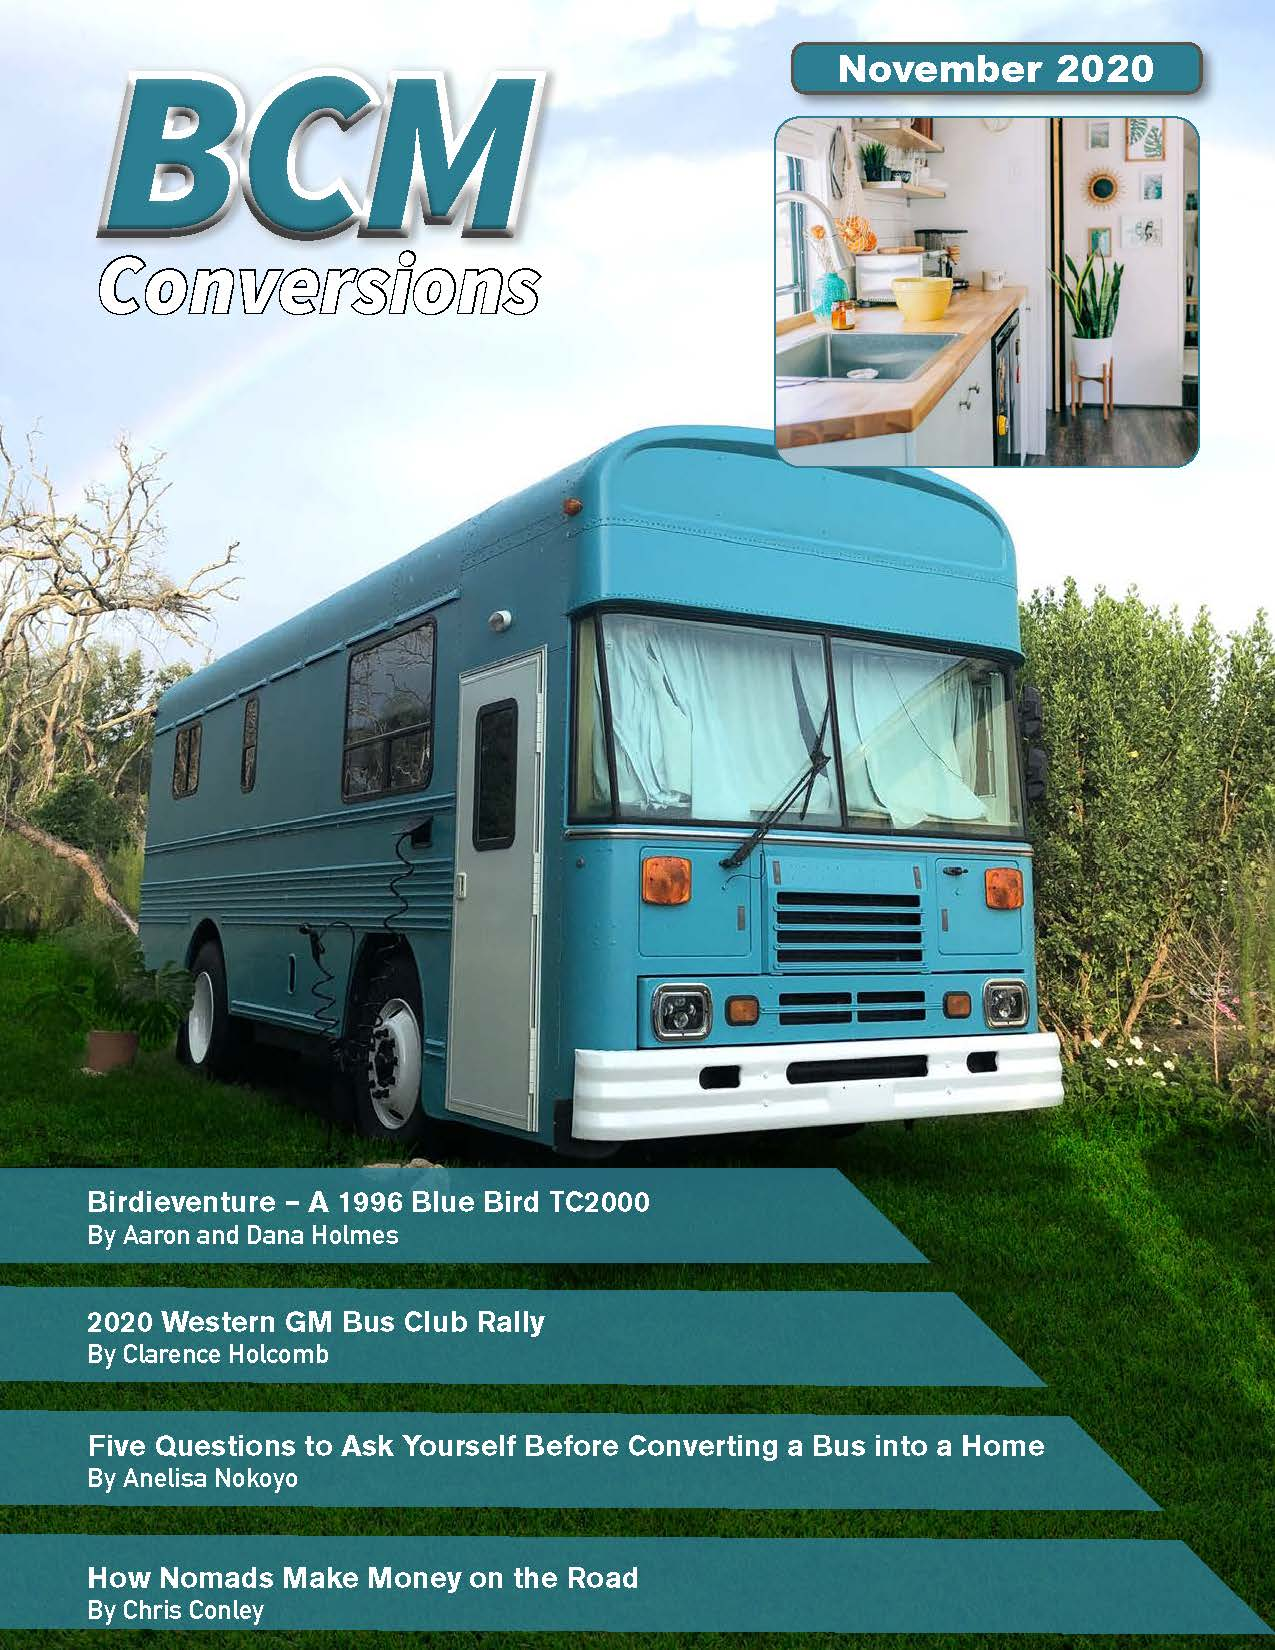 "<a href=""""><img class=""spu-open-10240"" src=""https://www.busconversionmagazine.com/wp-content/uploads/2020/10/November-Issue-2020-Toc.jpg""/></a>"